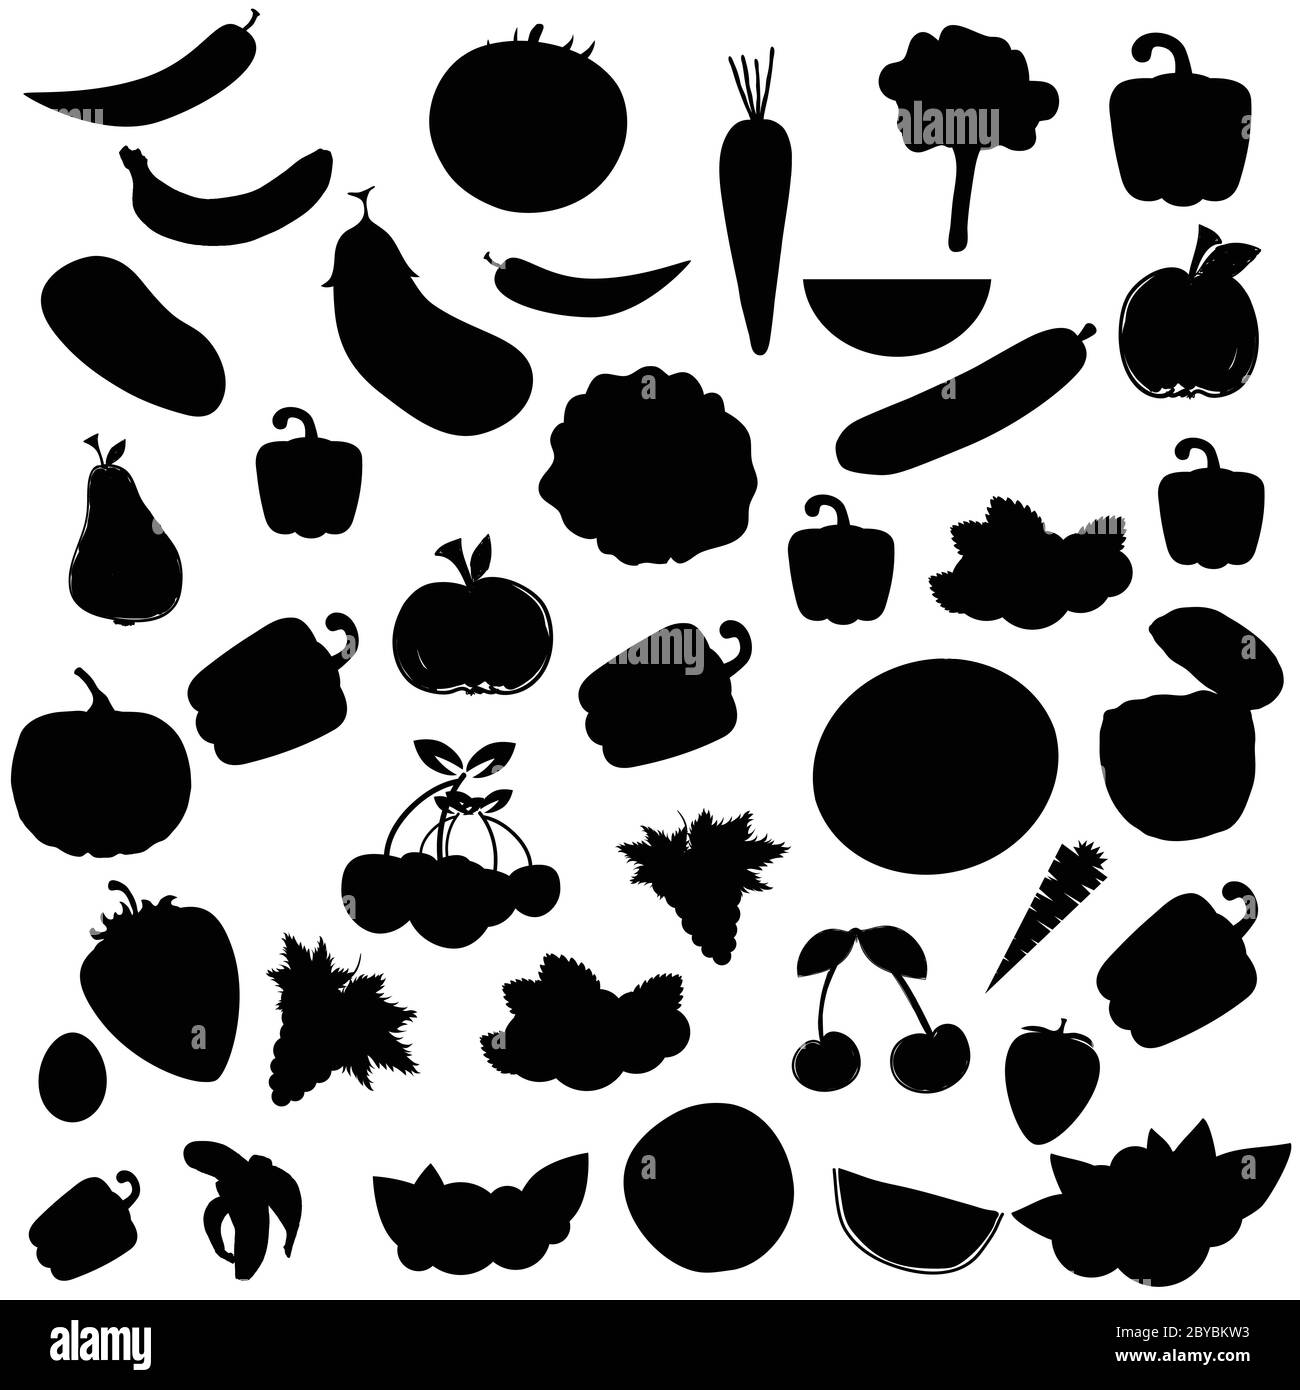 Fruit And Vegetable Food Set Illustration In Black Color Stock Vector Image Art Alamy